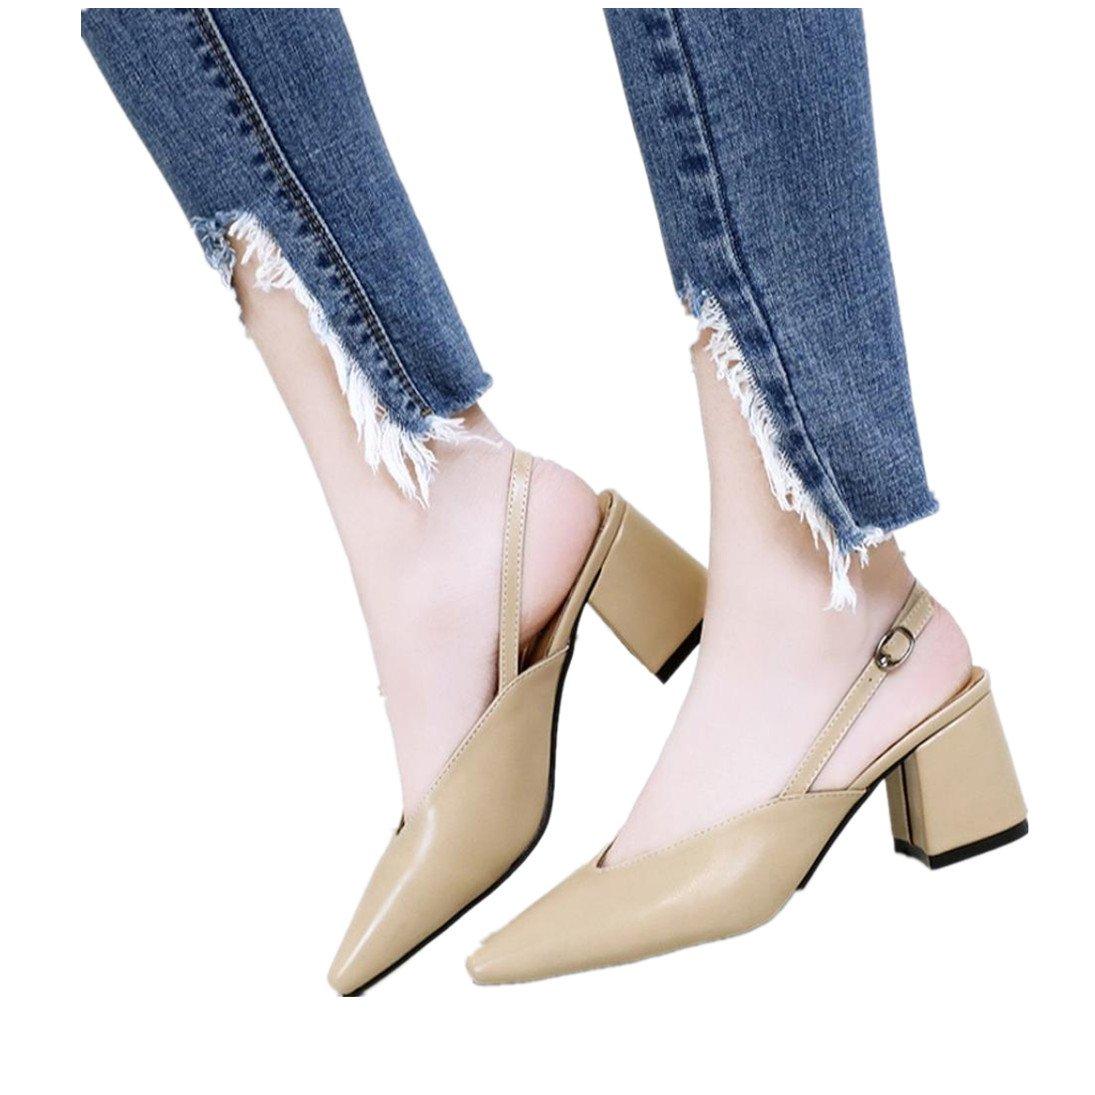 Fheaven (TM)) Women Ladies Pointed Toe Ankle Strap Shoes Slip-on High Heel Leisure Shoes (US:5, Khaki)